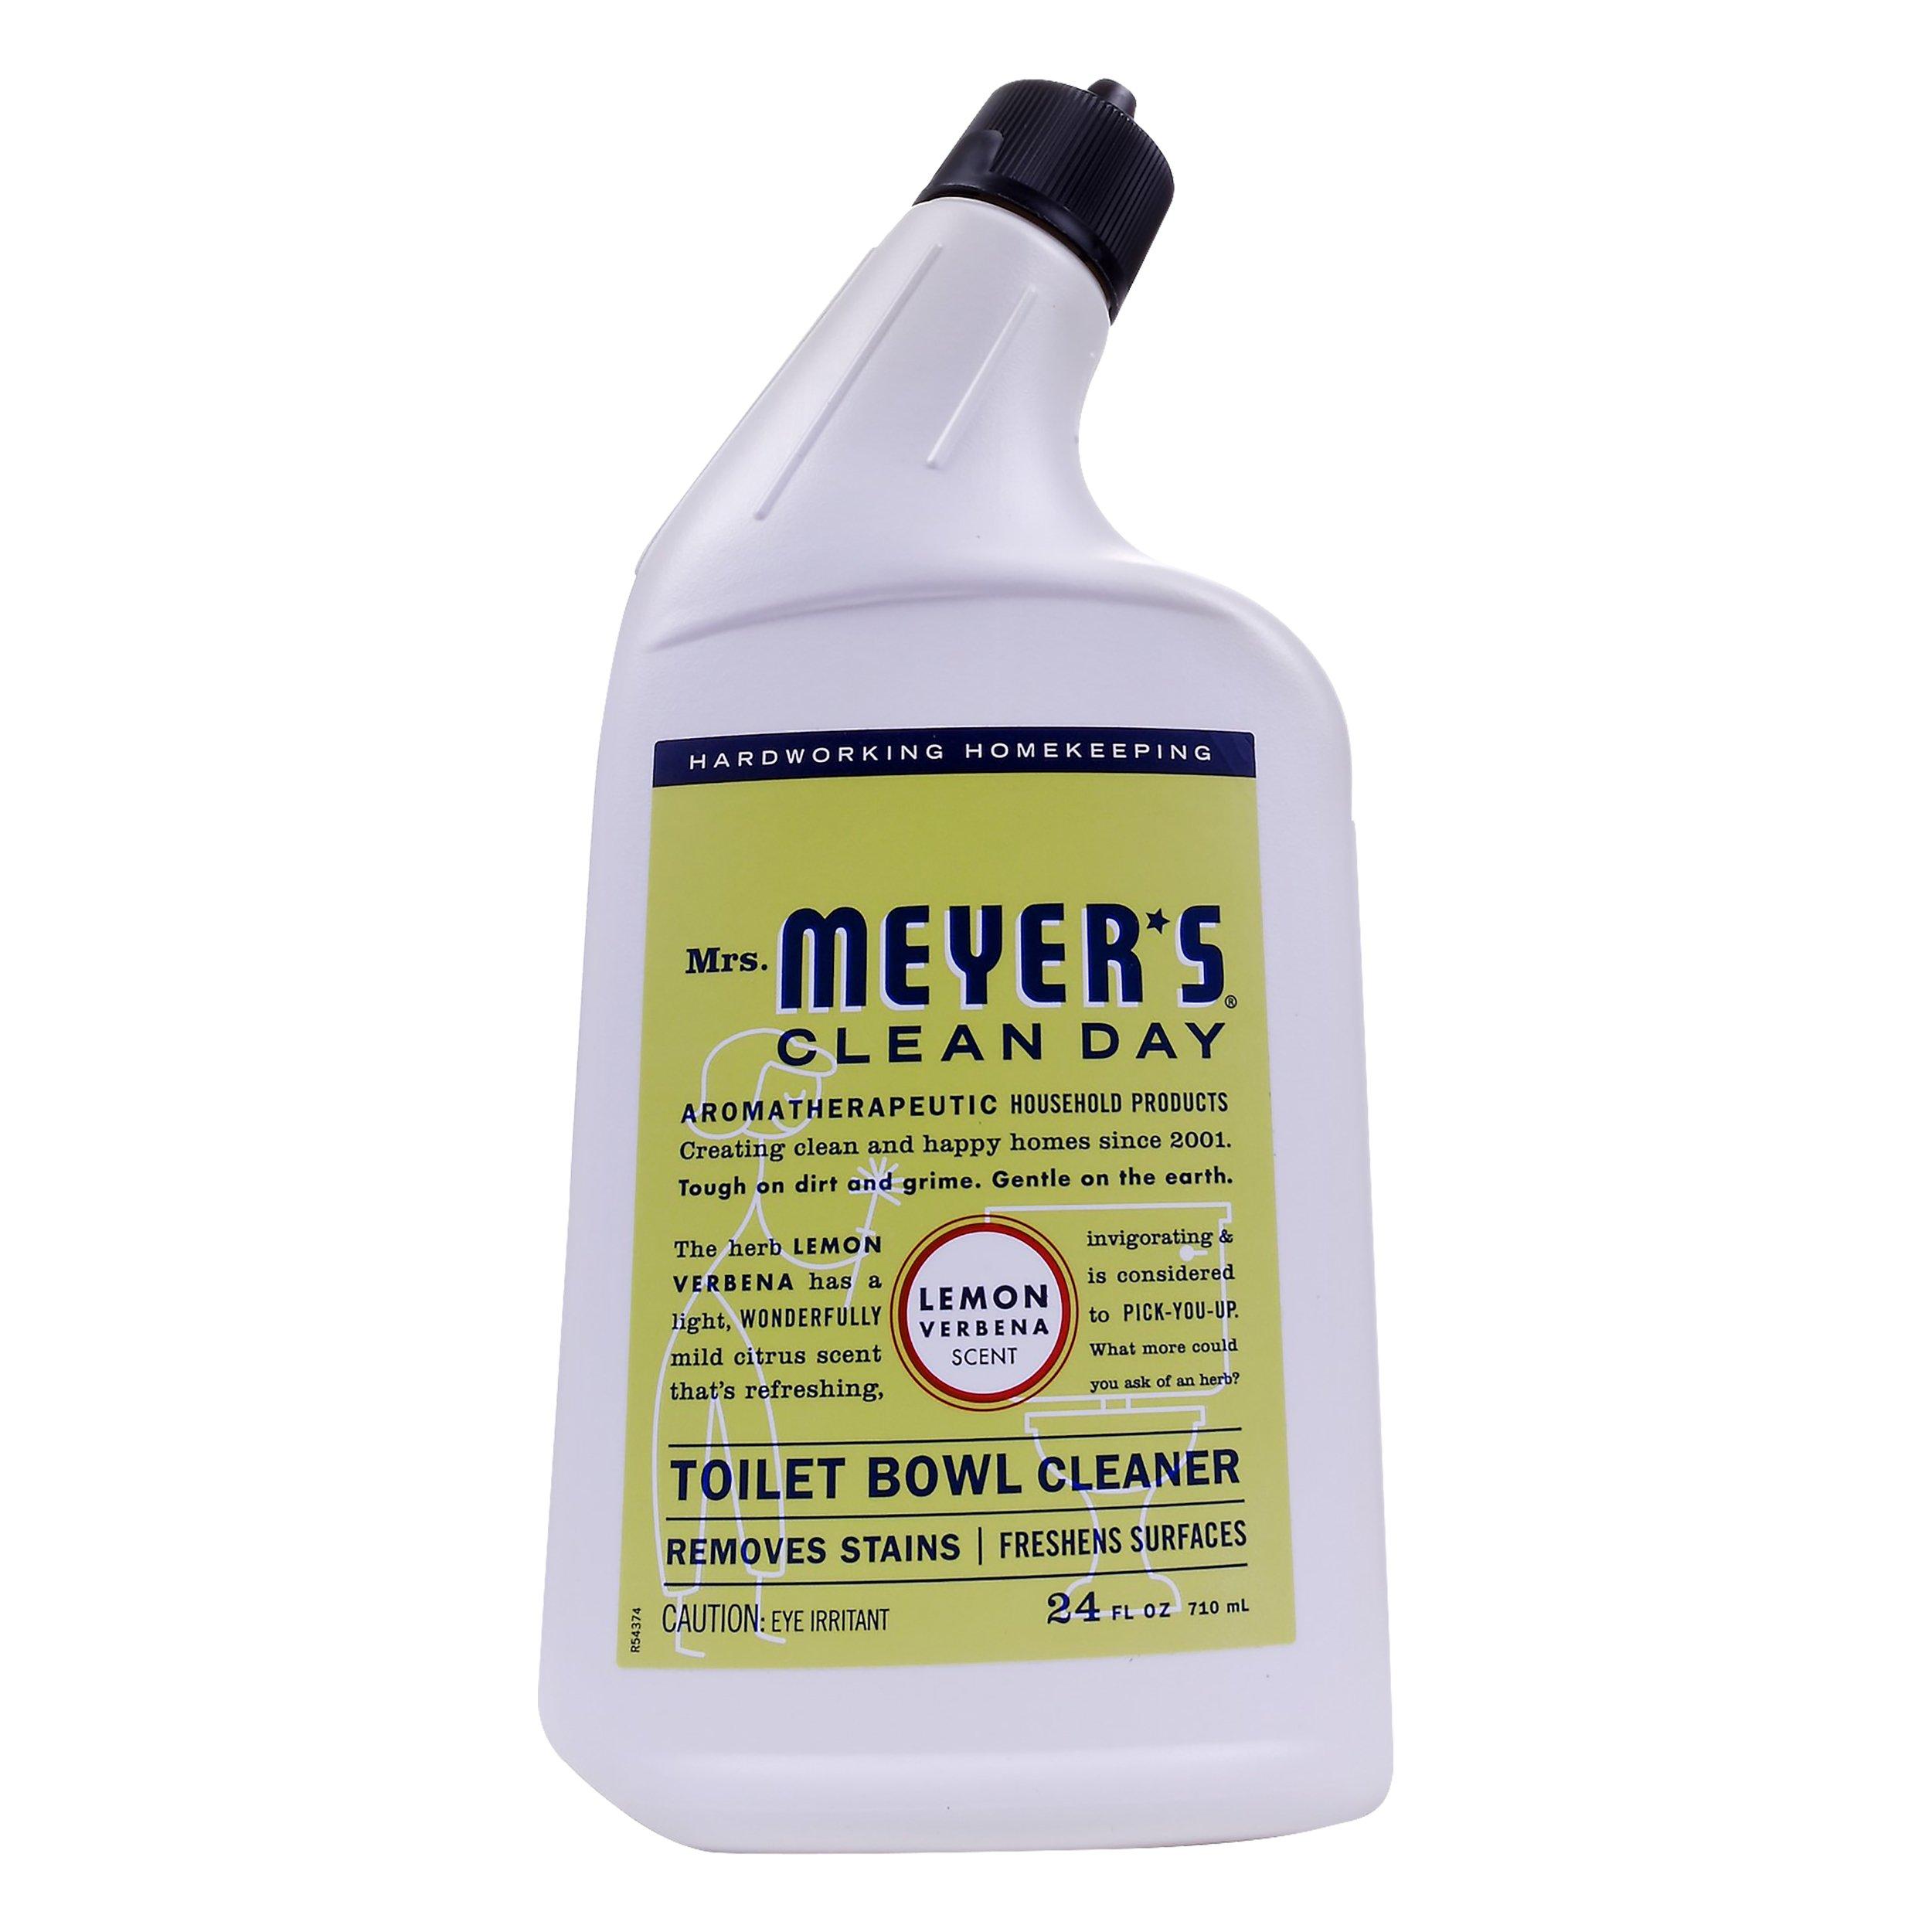 Mrs. Meyers Clean Day Lemon Verbena 24OZ 6-Pack